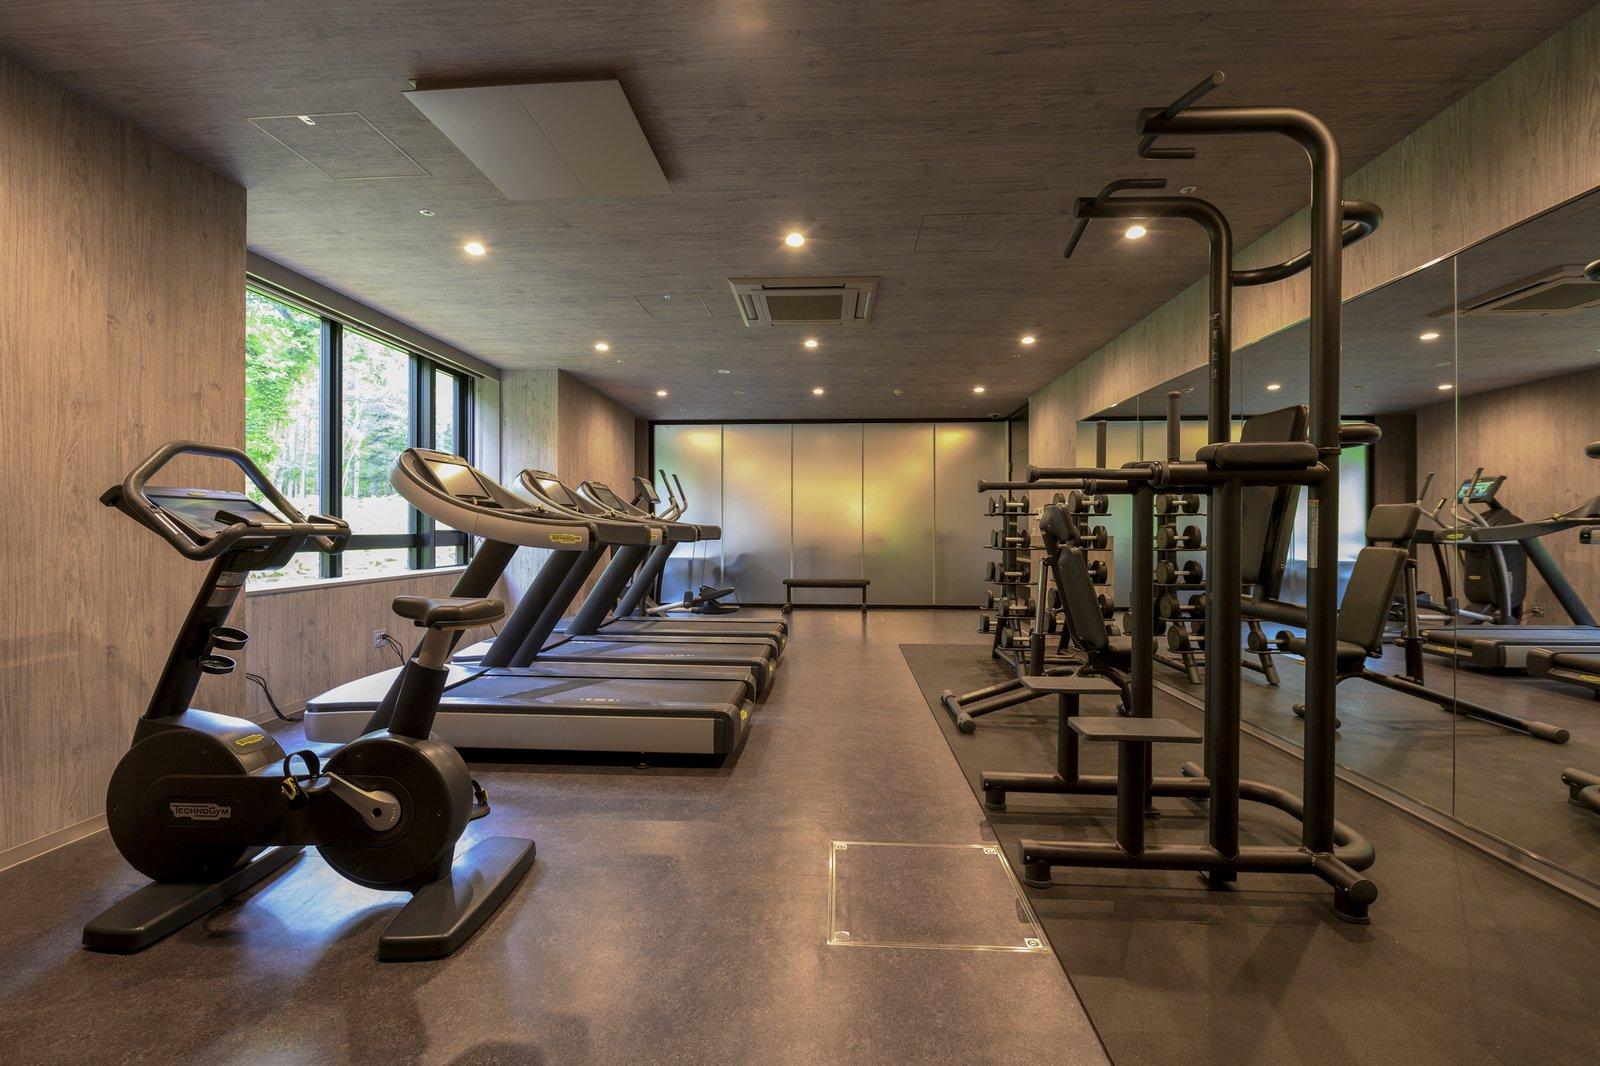 Midtown niseko gym large